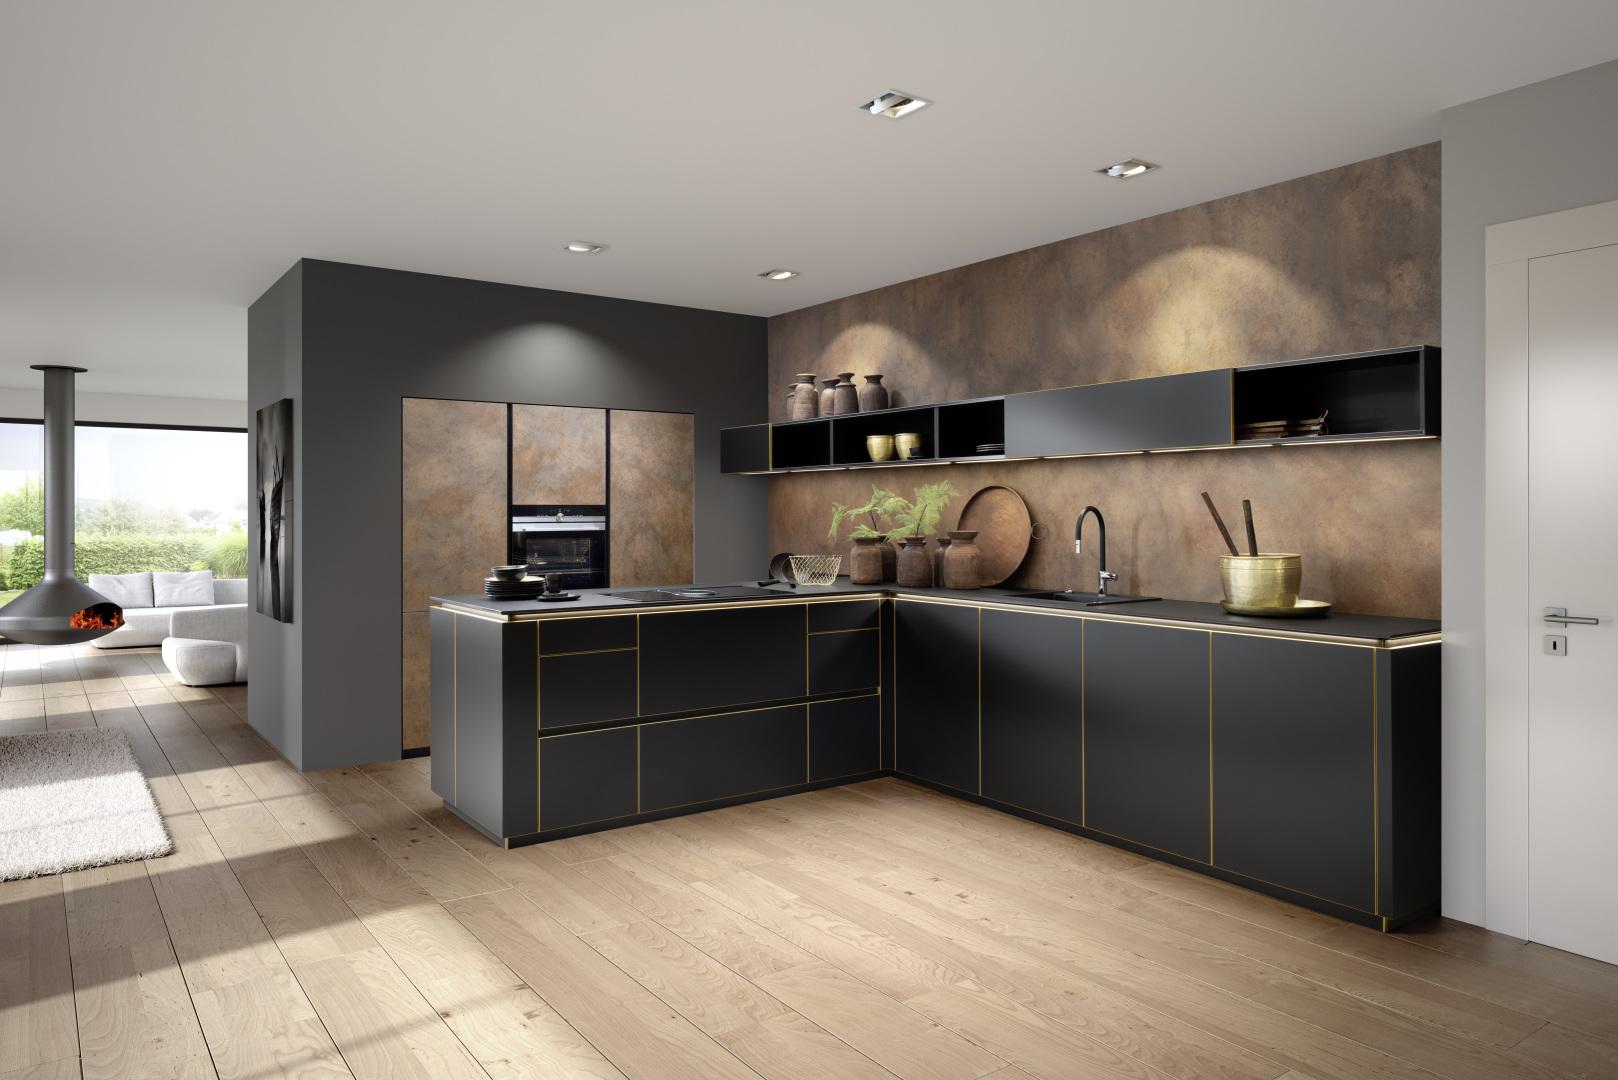 kche hannover good free musterring kuche largo kuchen hannover erfahrung kche category with. Black Bedroom Furniture Sets. Home Design Ideas